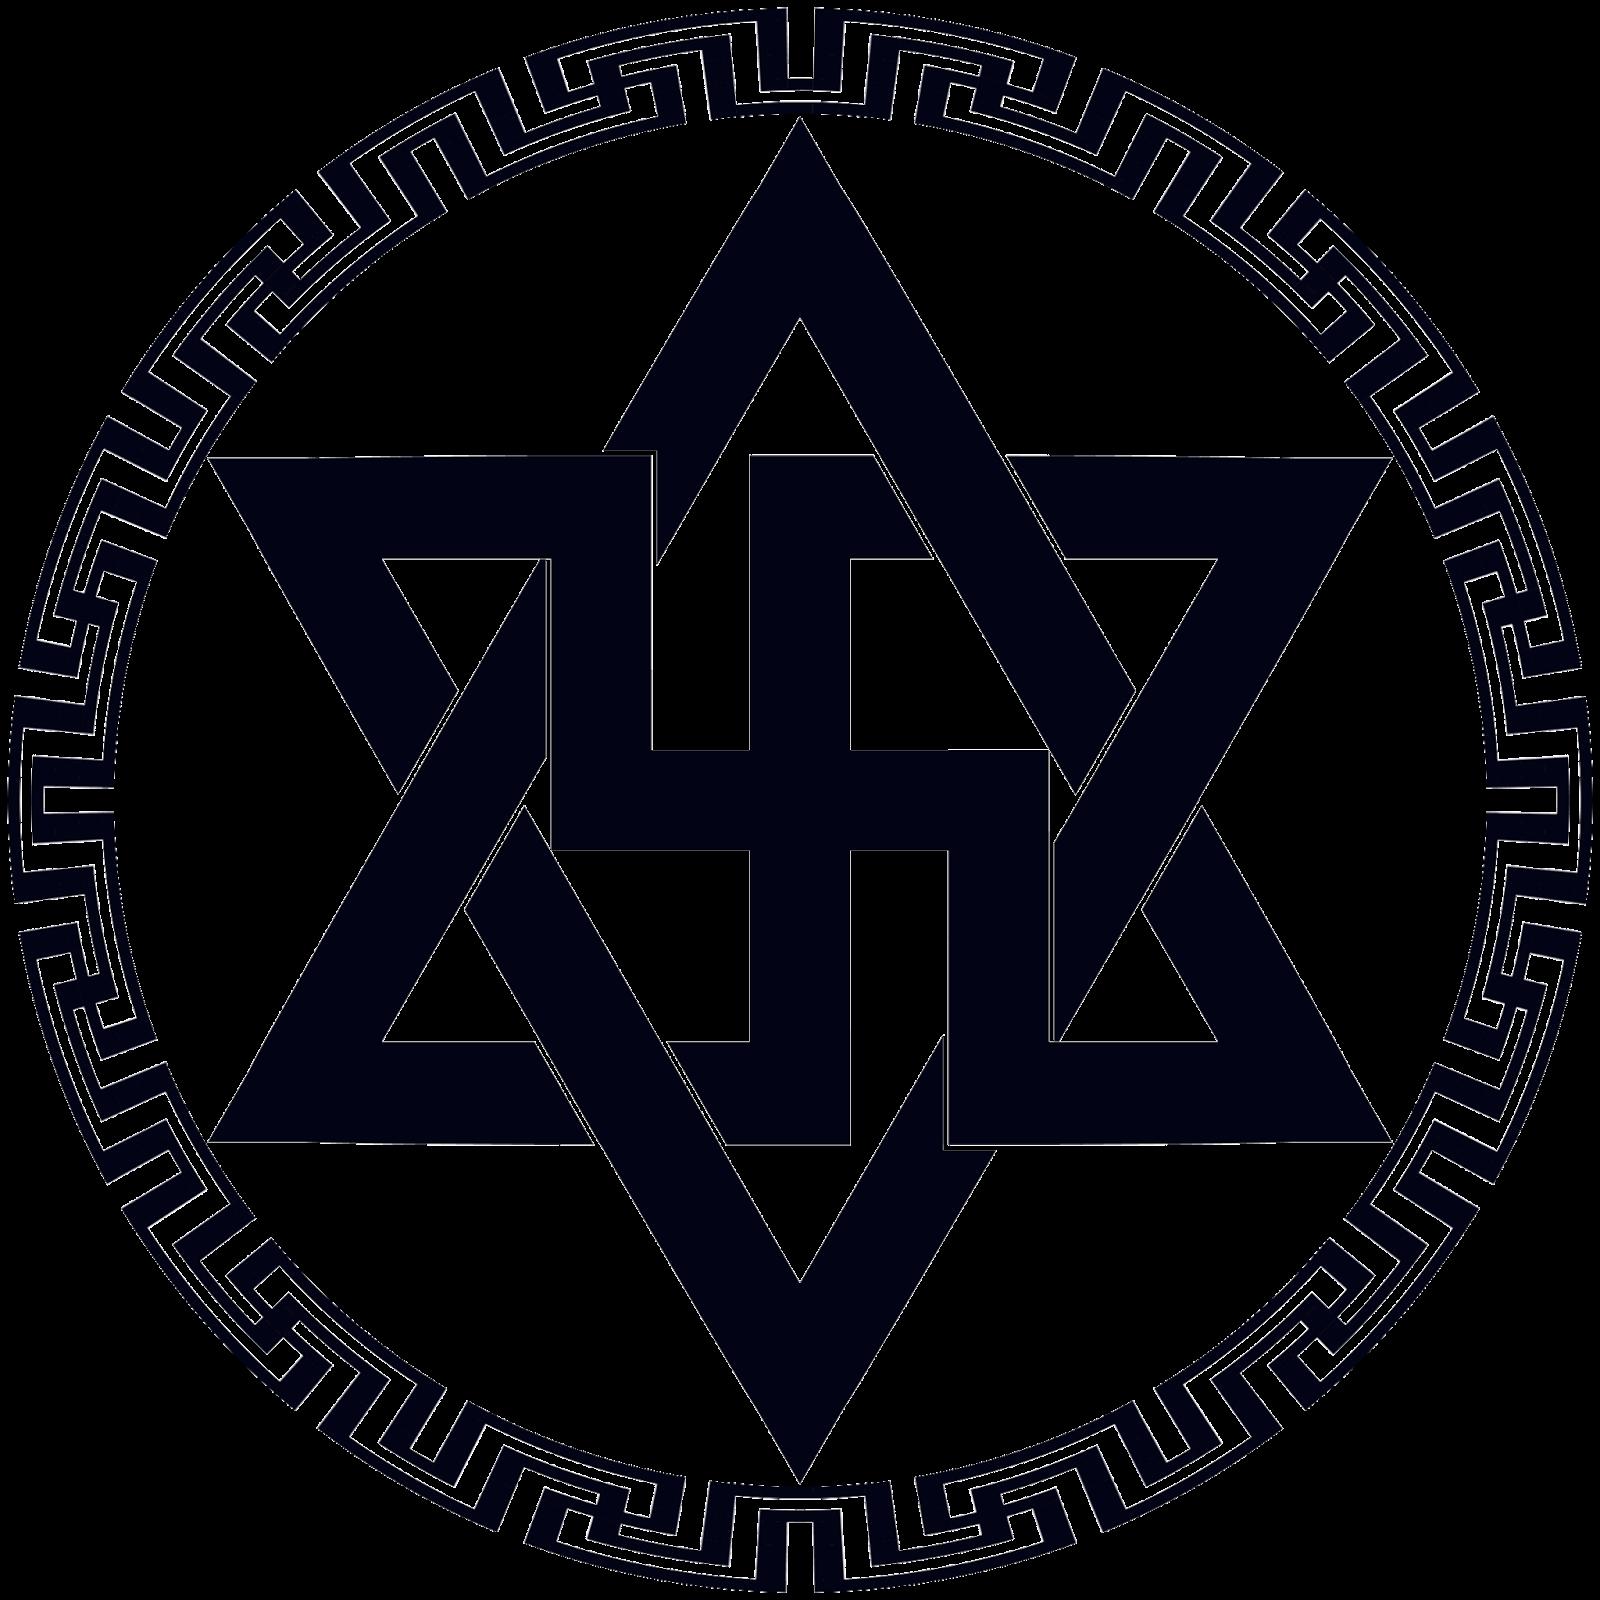 Nazi symbolism